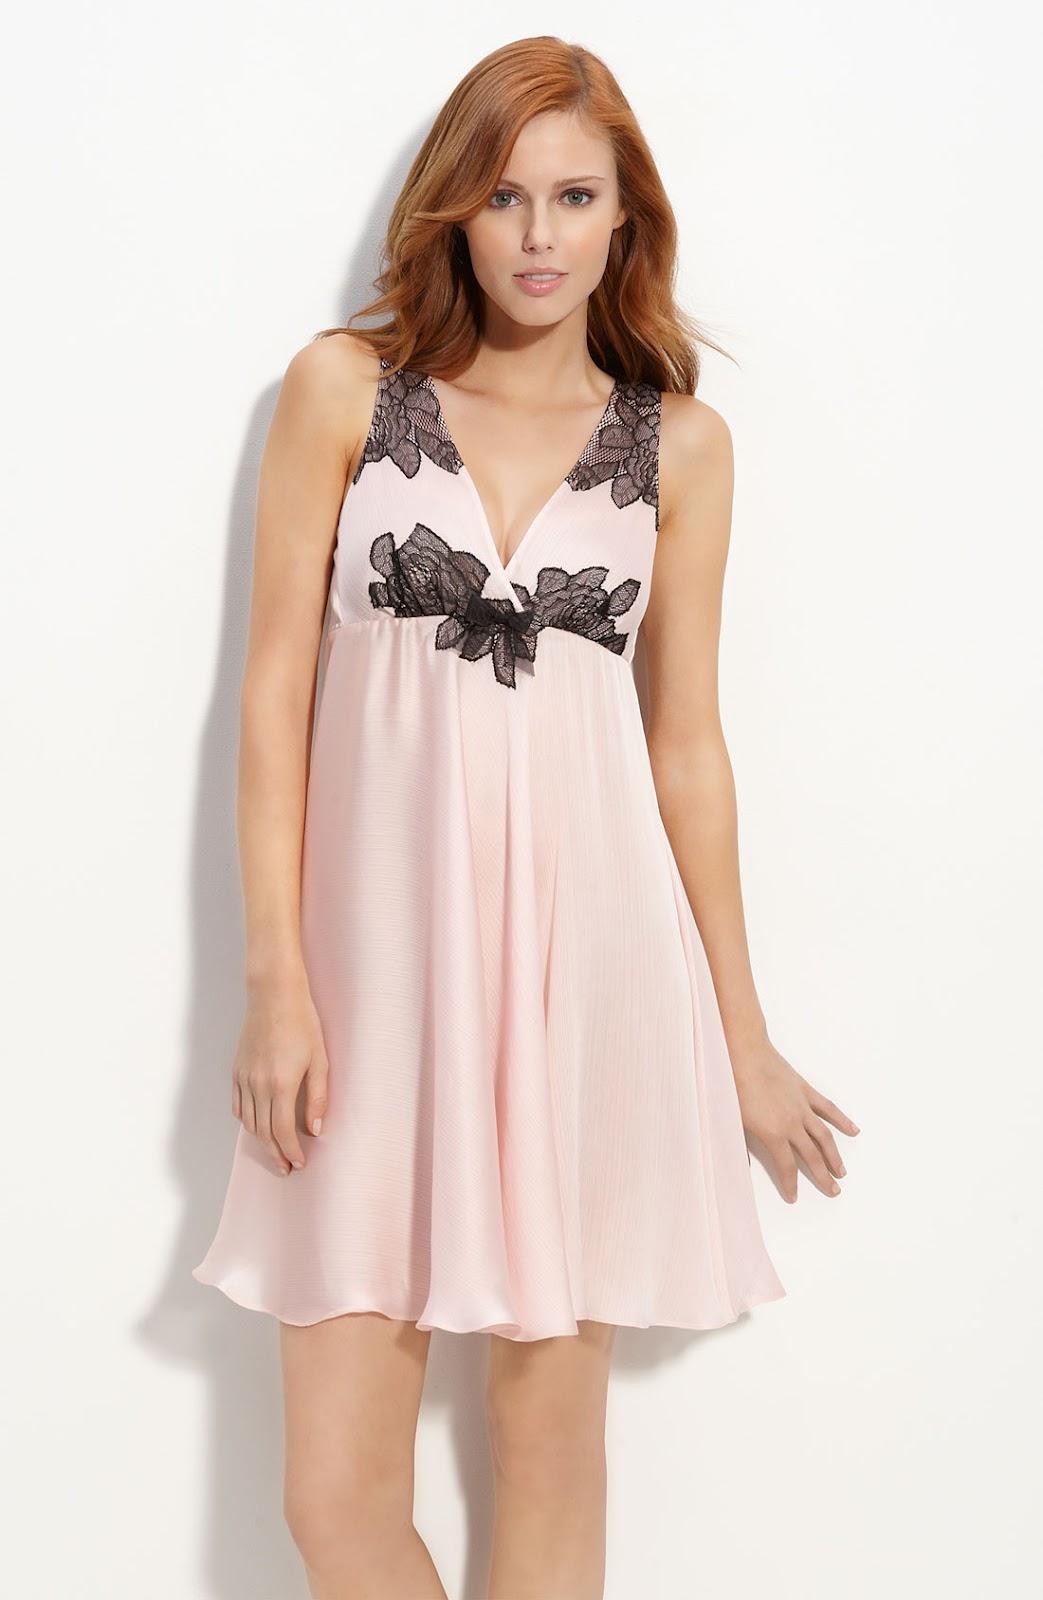 Think, alyssa campanella lingerie was